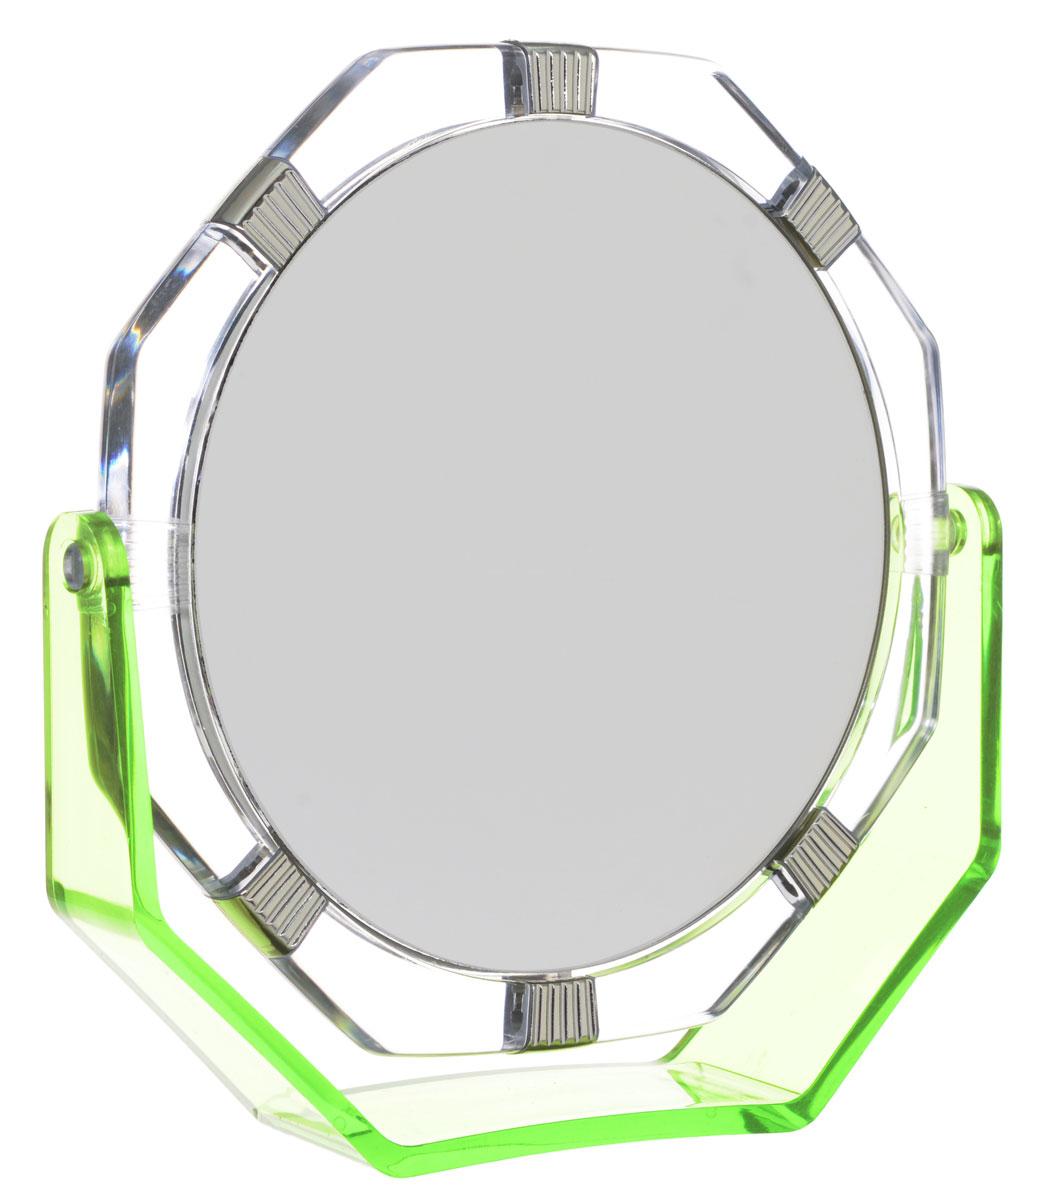 Зеркало Beiron 1138 настольное, двустороннее, d 17, 5см, x2 цена